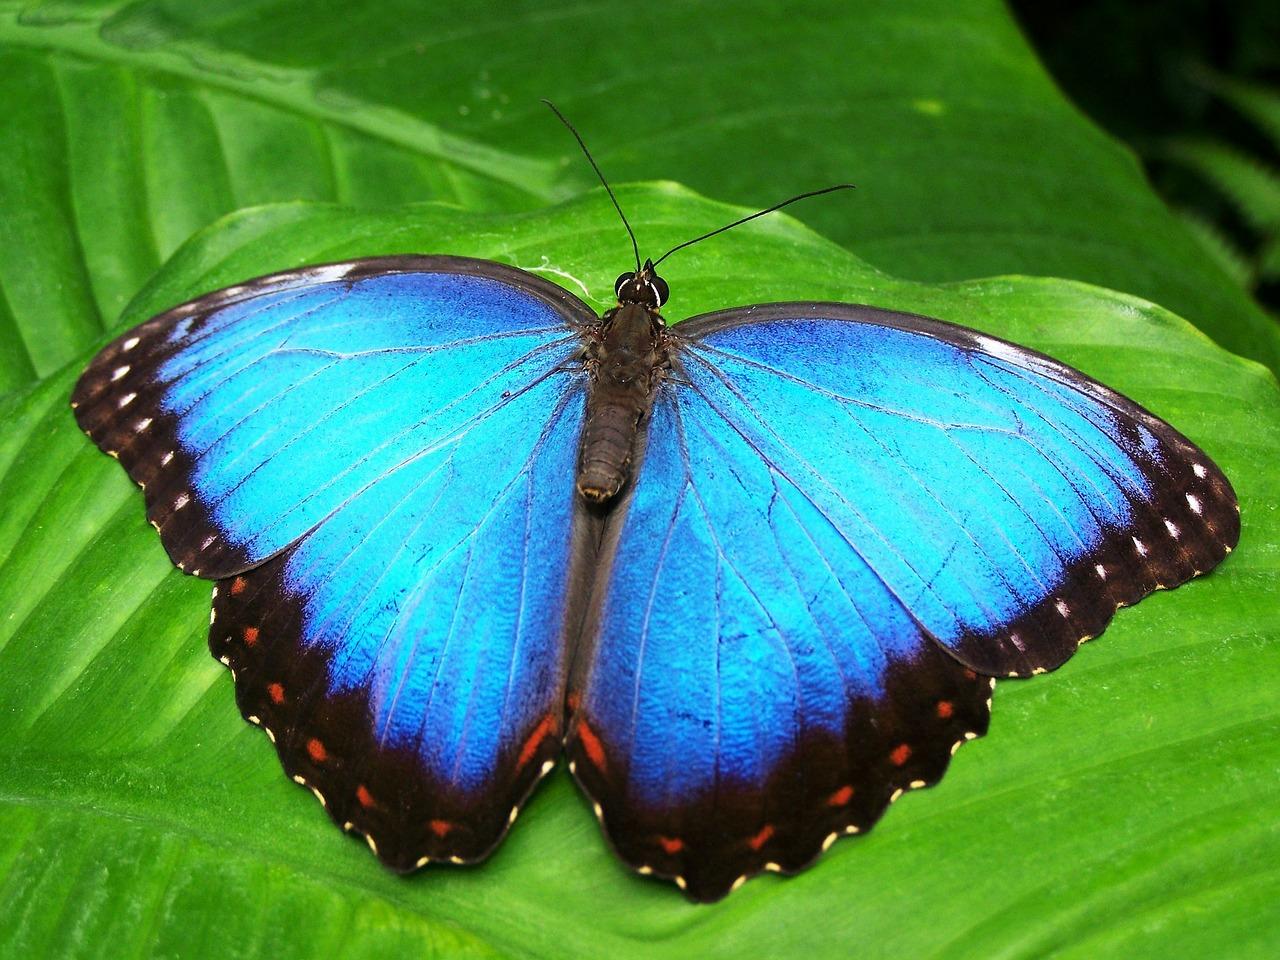 Environmental Health Trust Bees, Butterflies and Wildlife